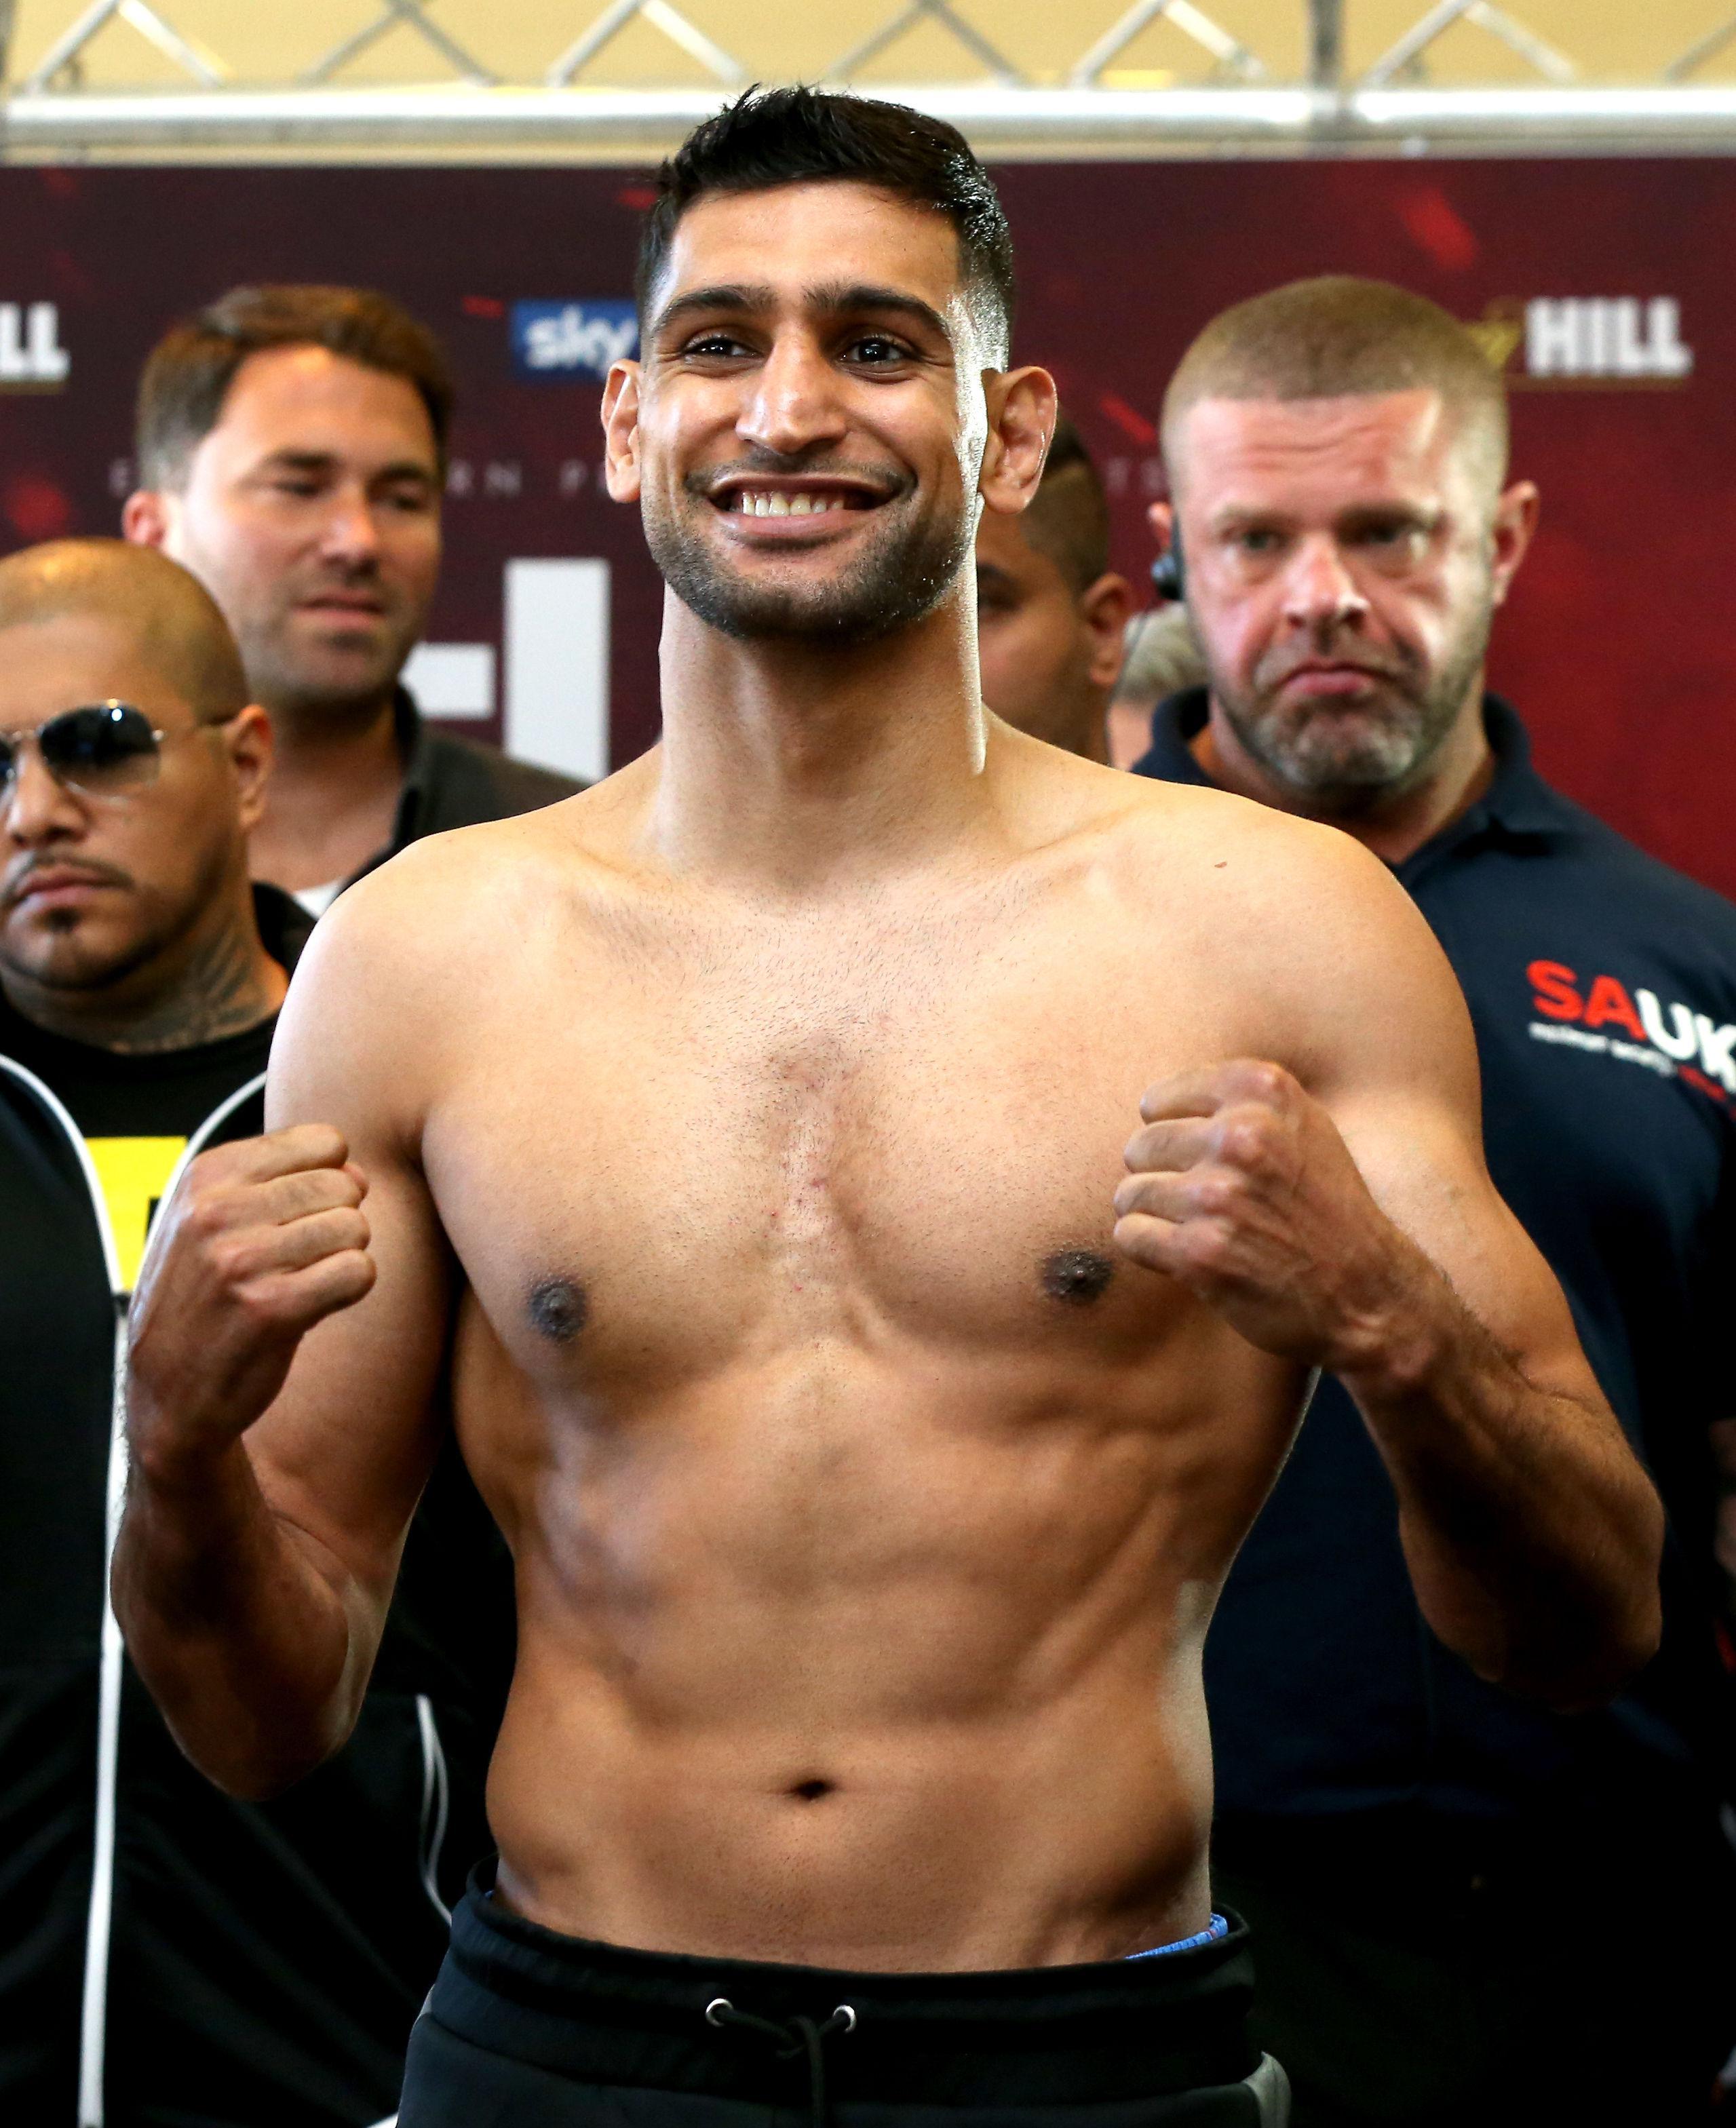 Welterweight ace Amir Khan is preparing to face Samuel Vargas on September 8